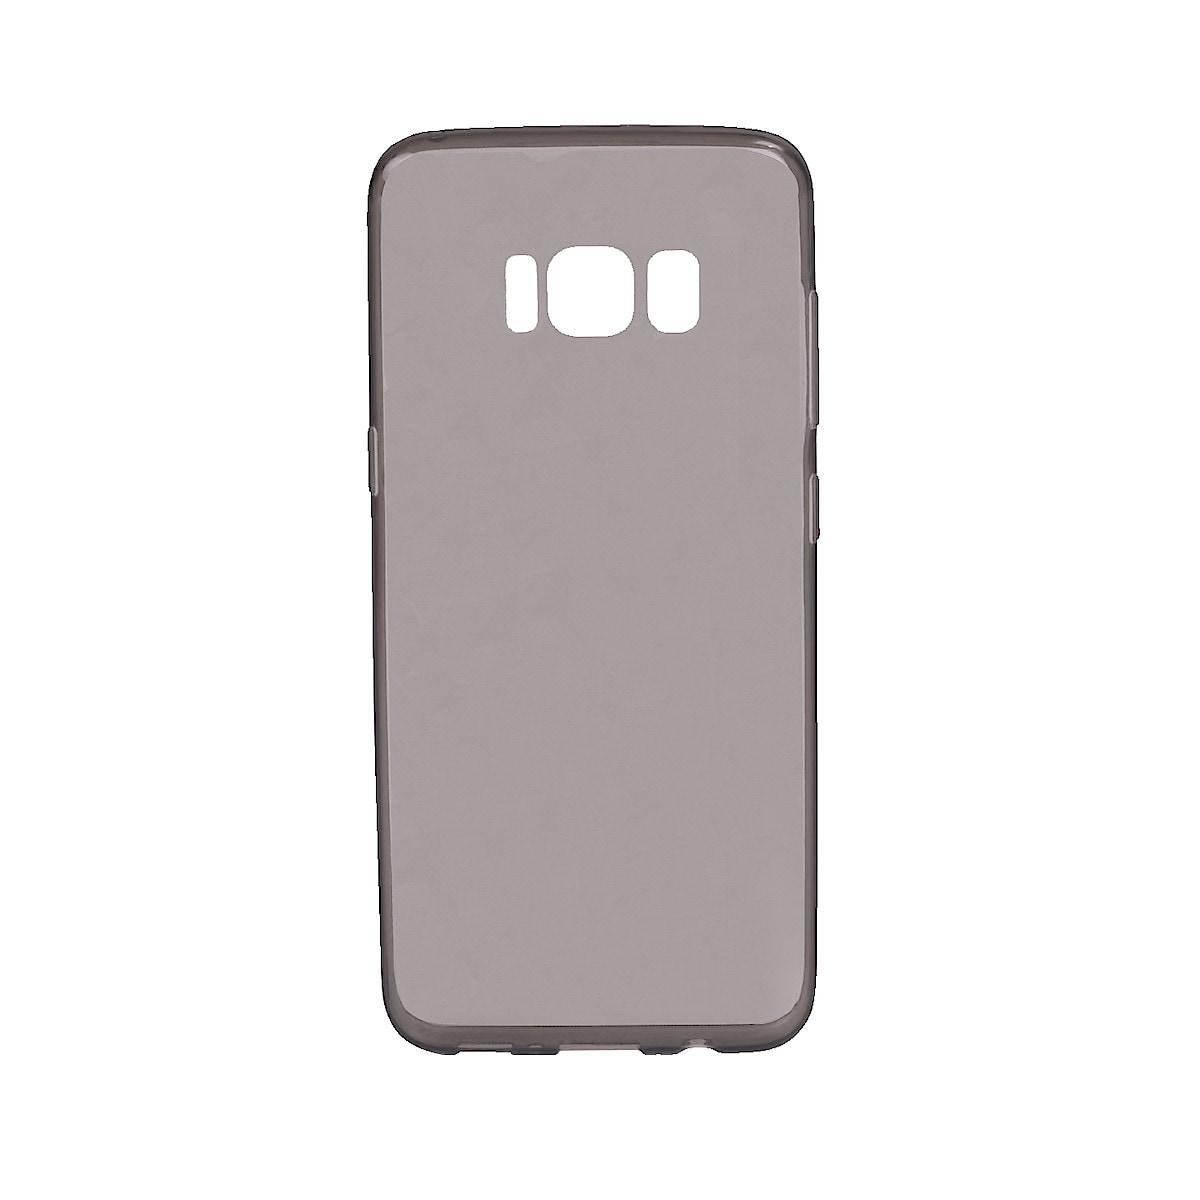 Easy Grip mobildeksel for Samsung Galaxy S8